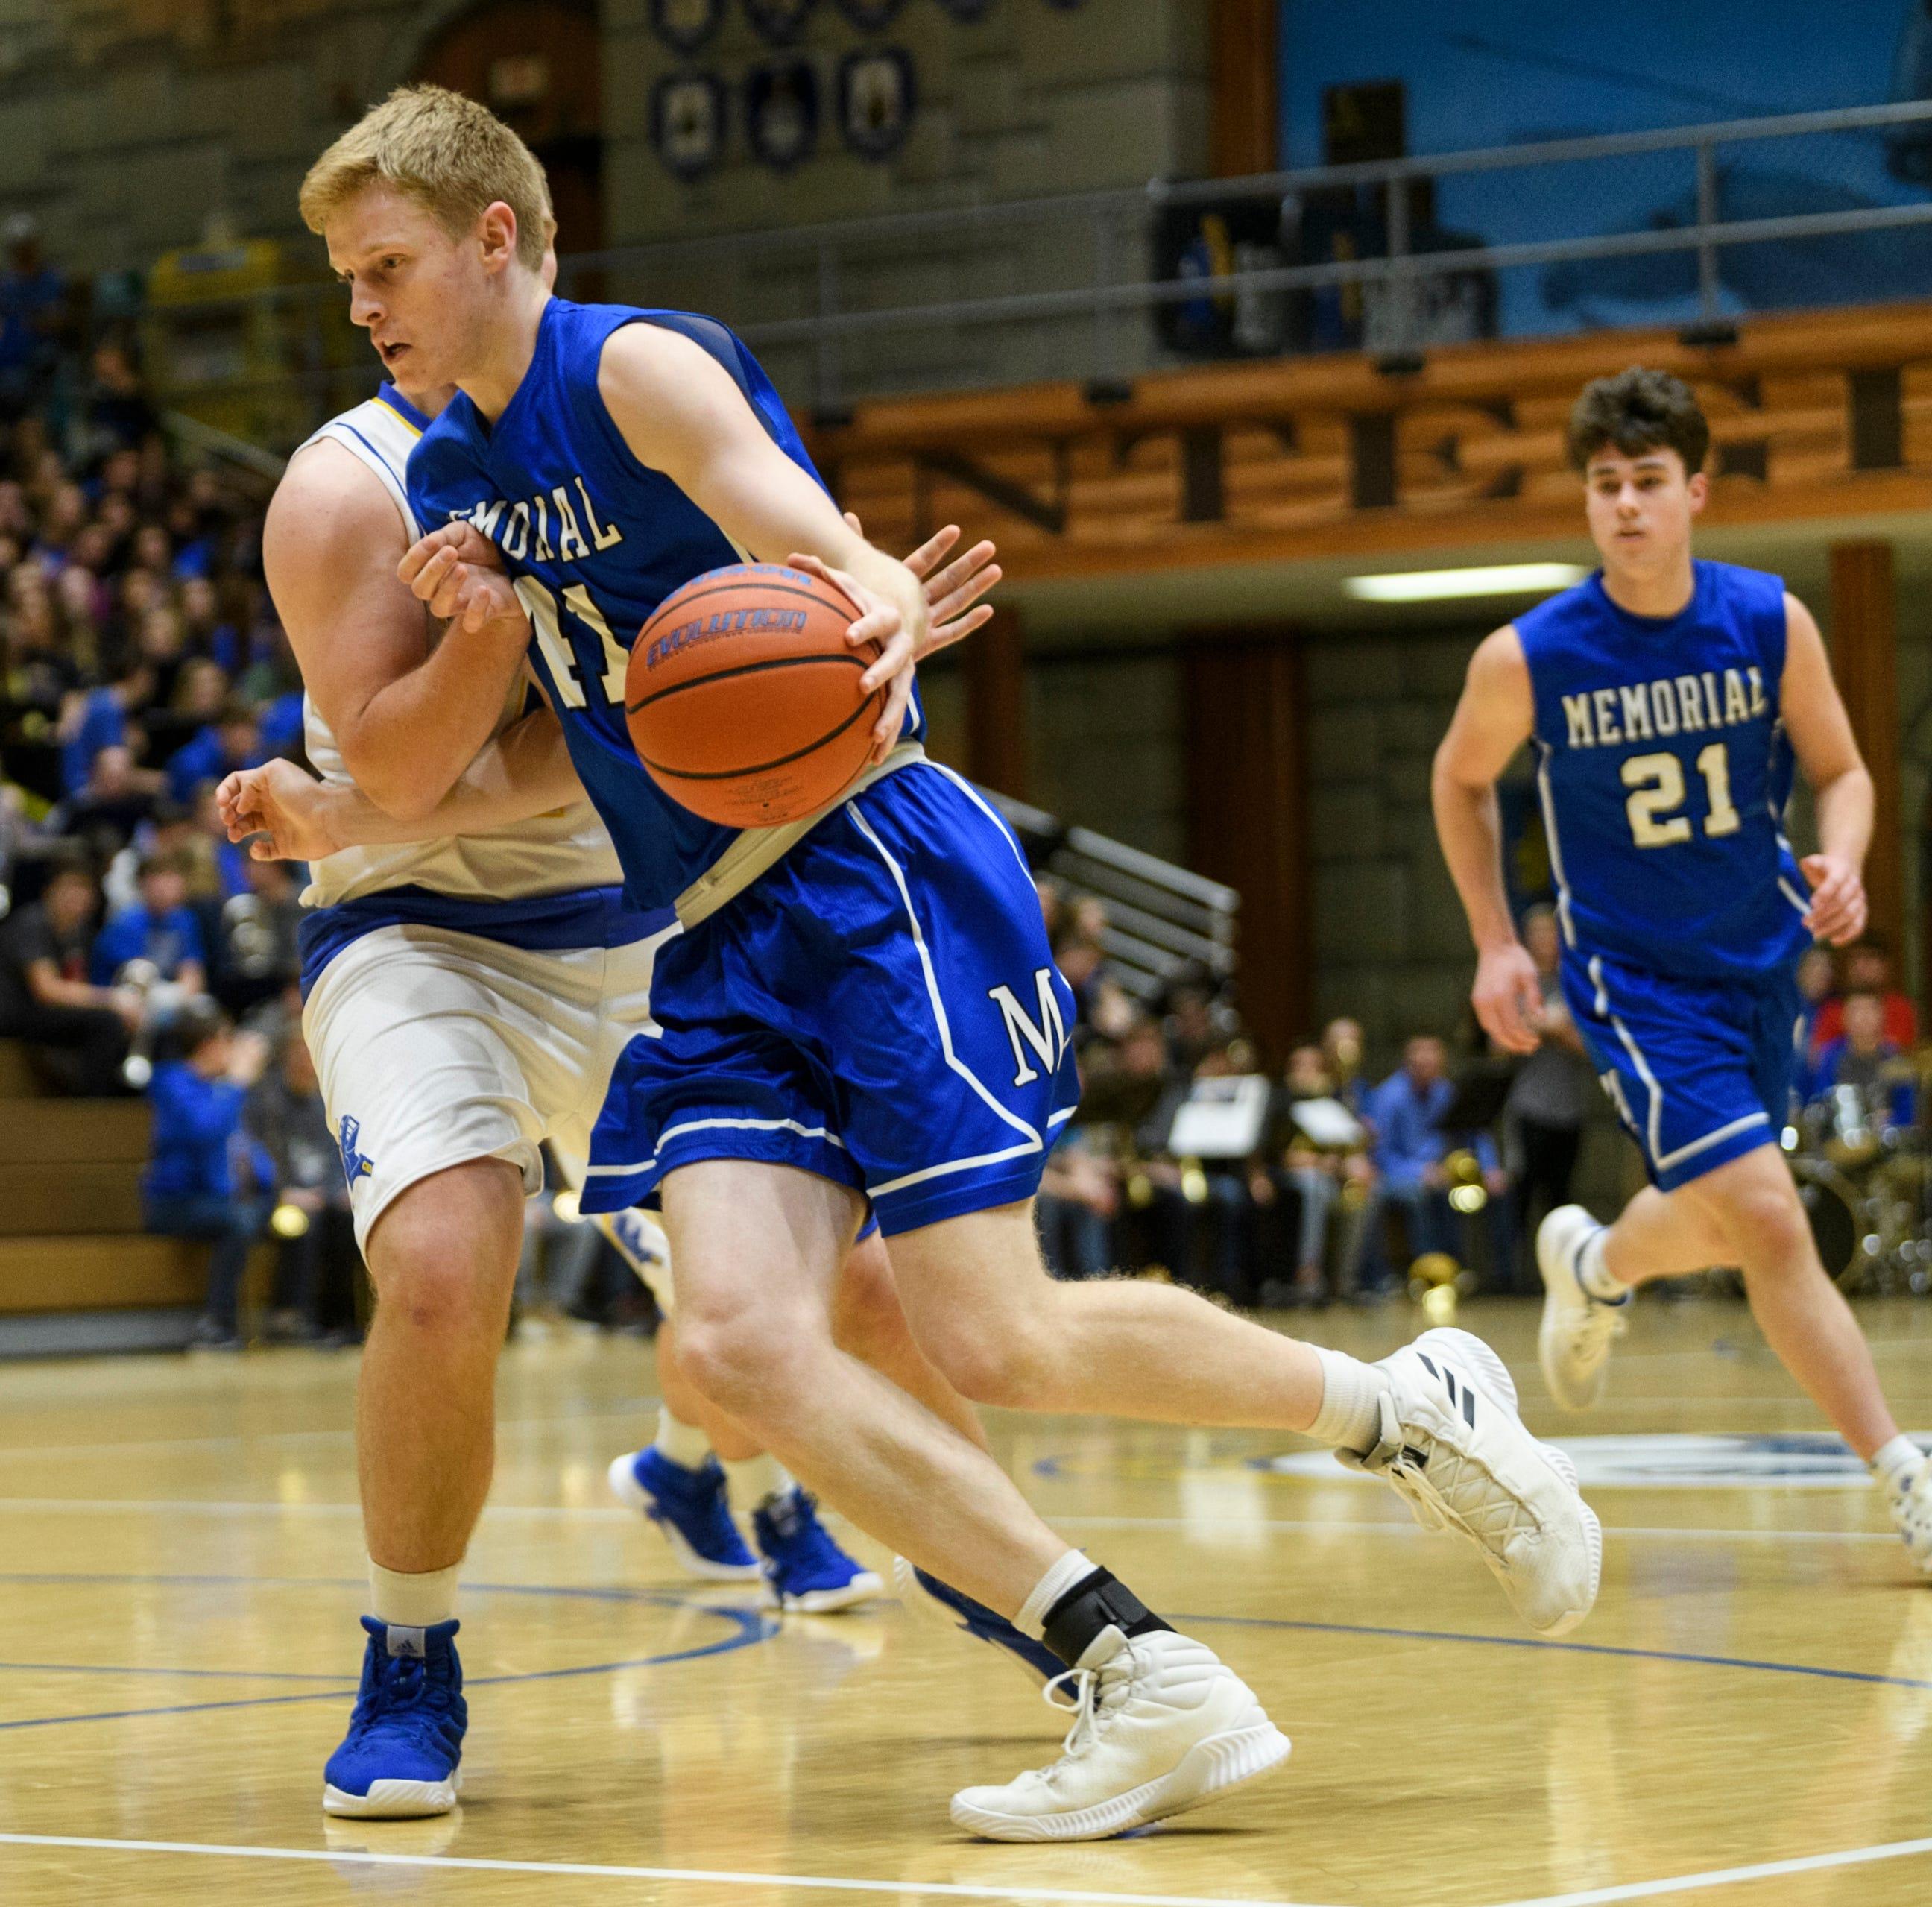 Evansville-area high school basketball scores for Jan. 5, 2019